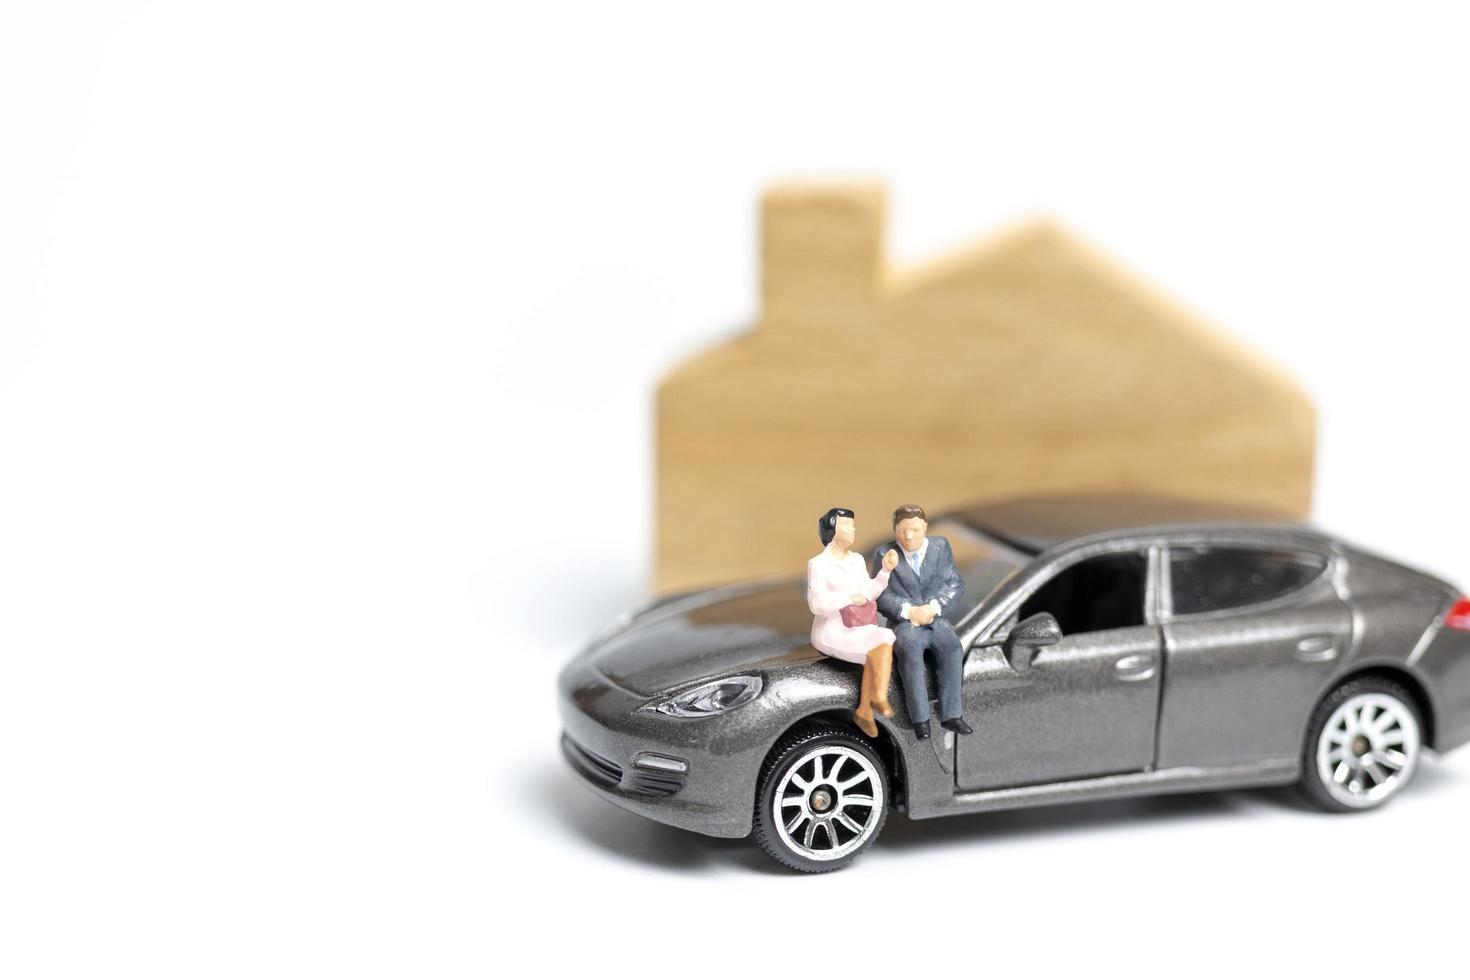 miniatyrfolk som sitter på en bil på en vit bakgrund foto